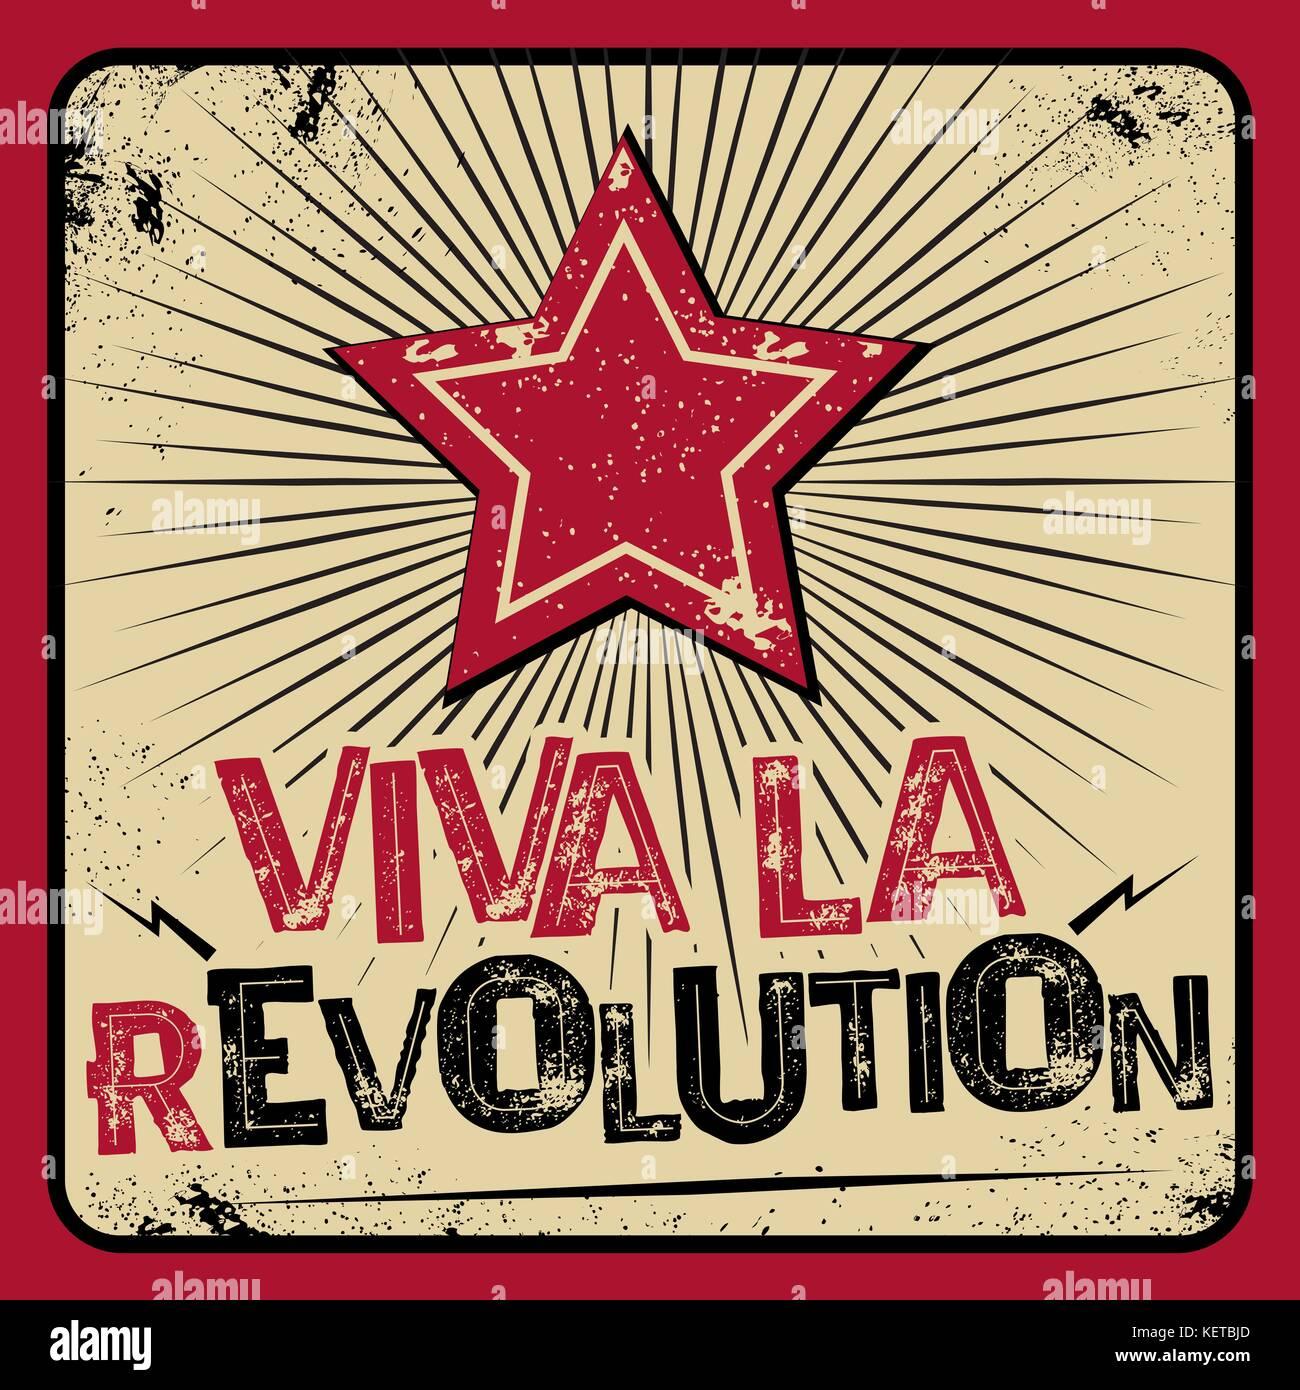 Viva la revolution poster - Stock Vector